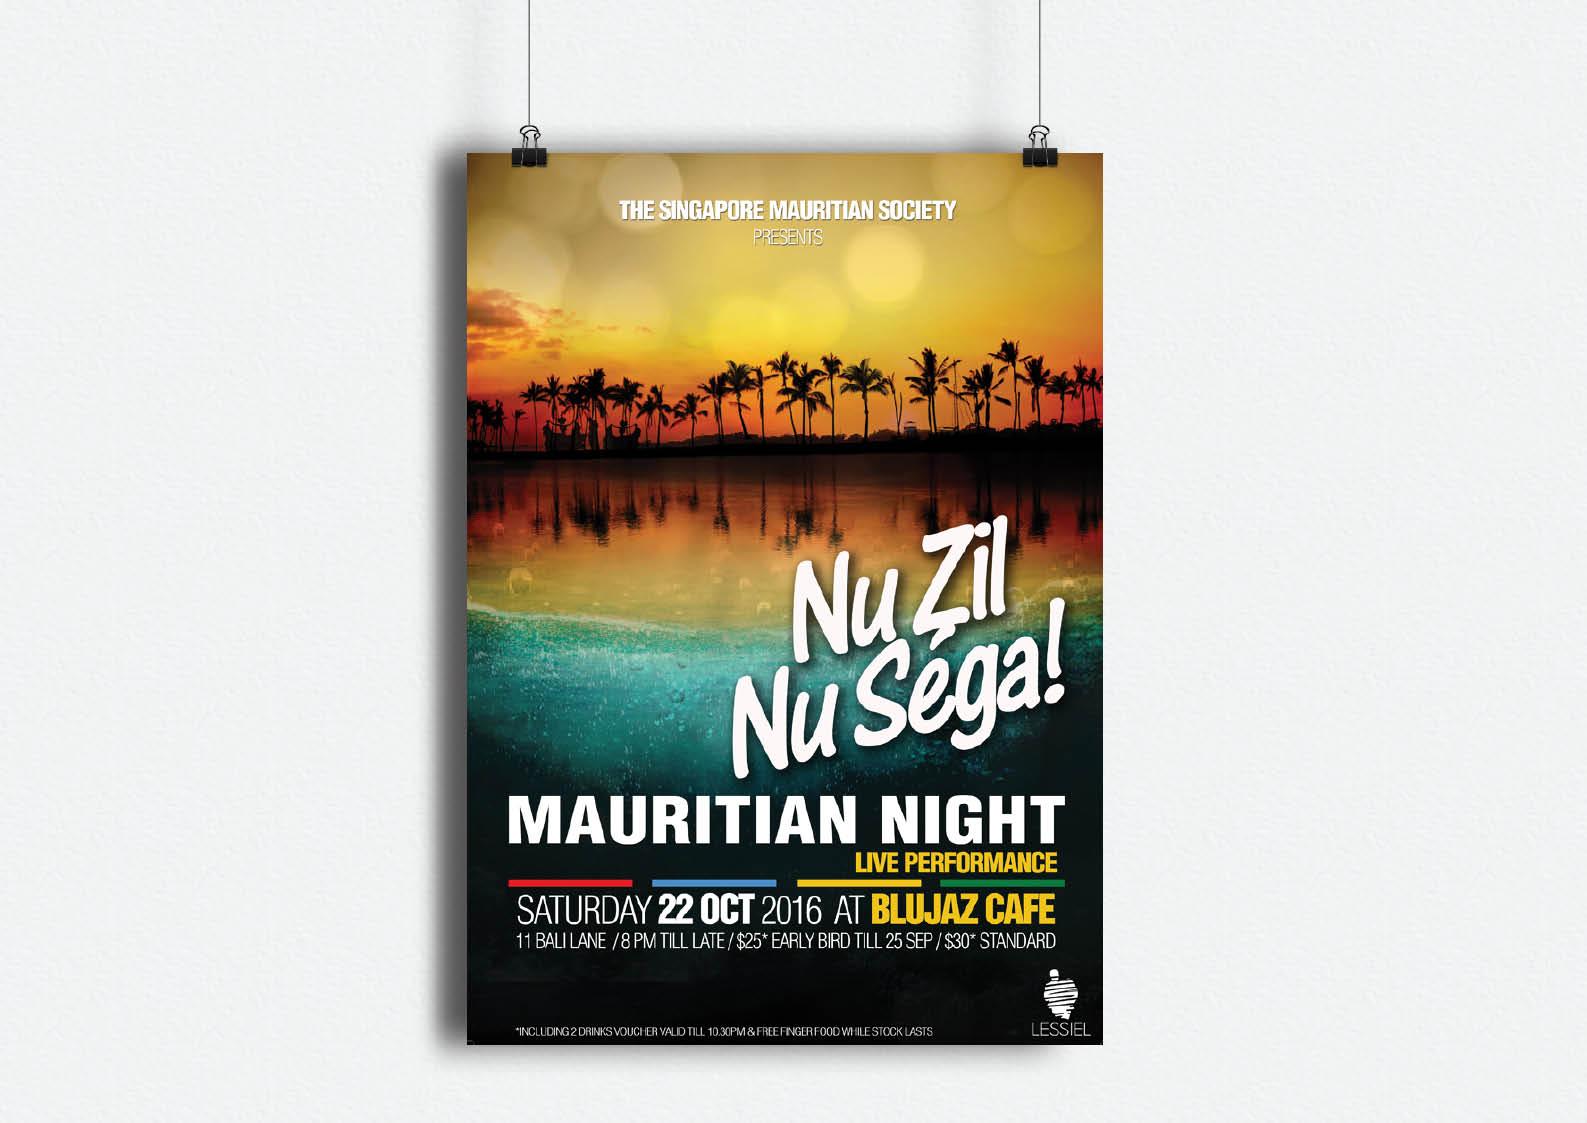 mauritian-night-singapore-03